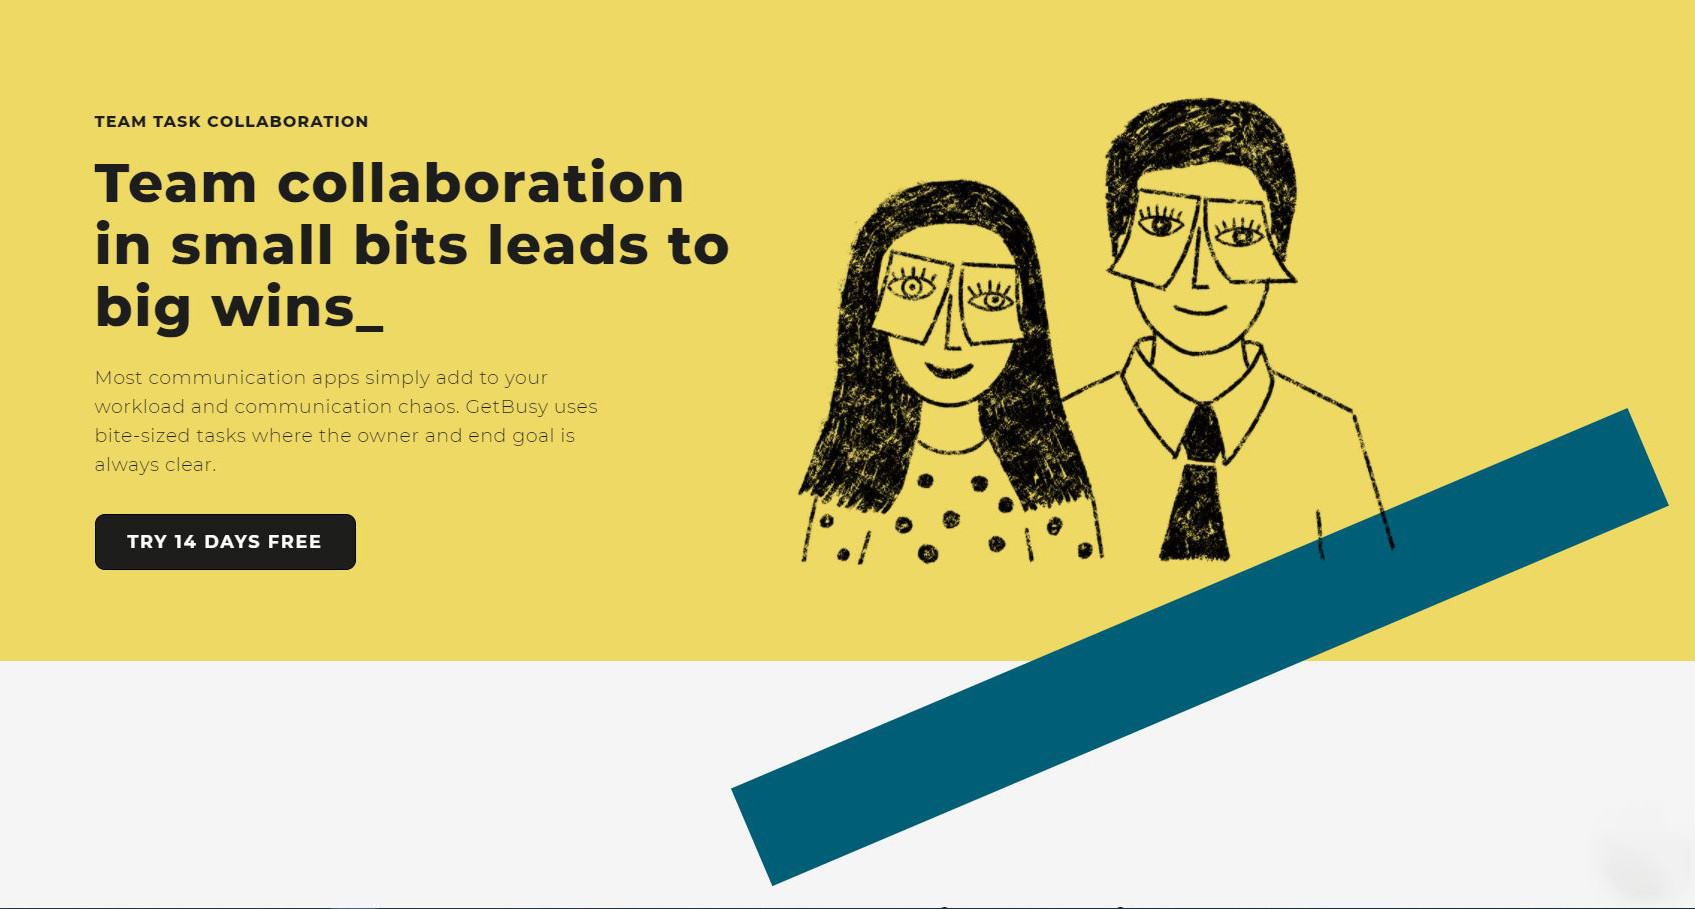 Team collaboration in small bits leades